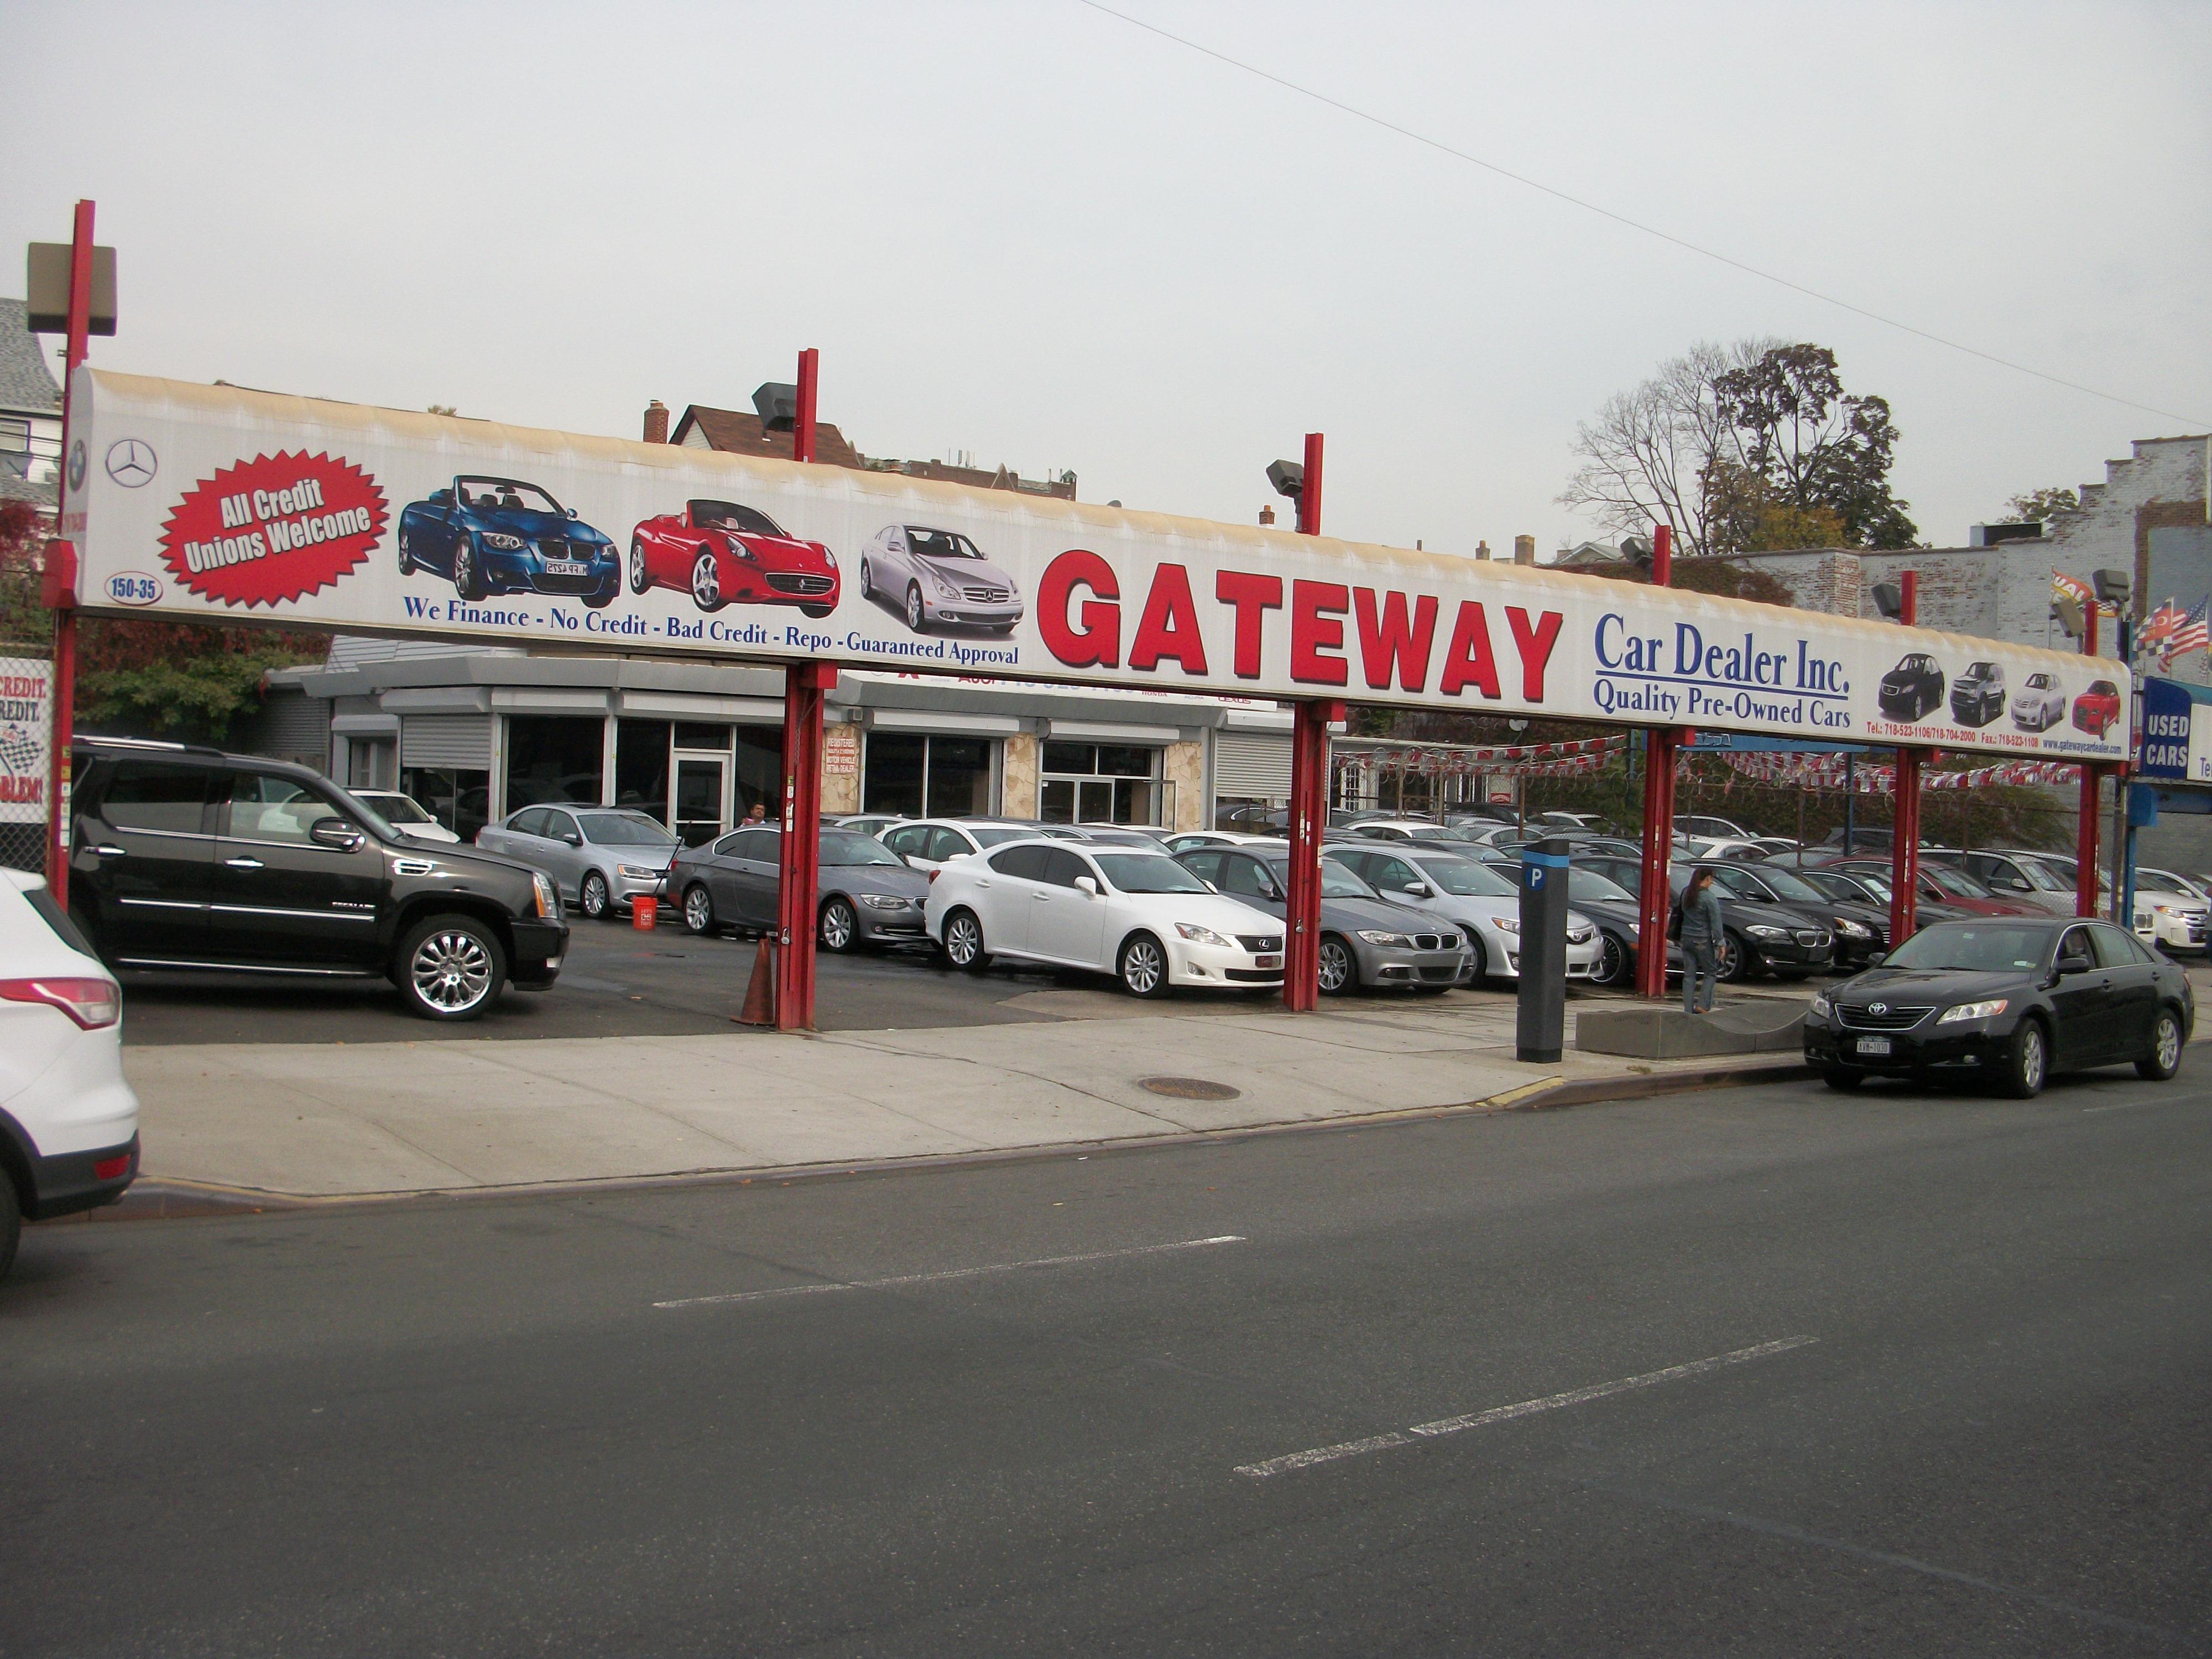 Gateway Car Dealer Inc